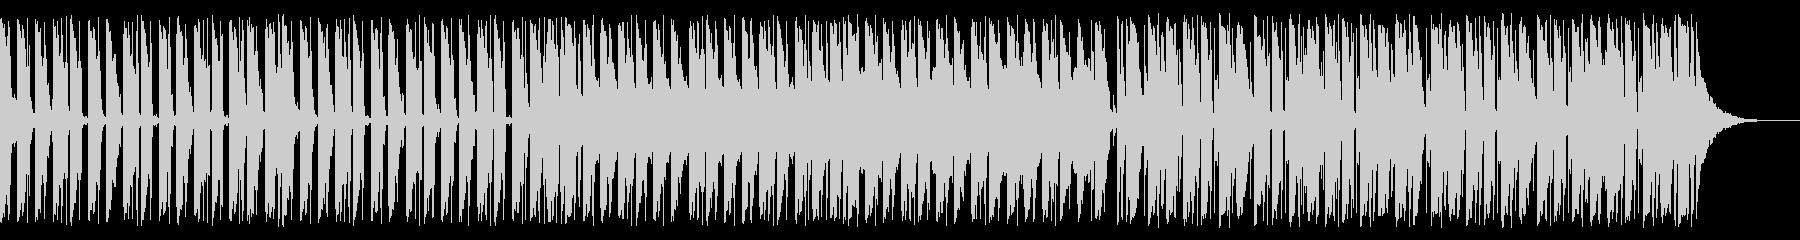 133 BPMの未再生の波形